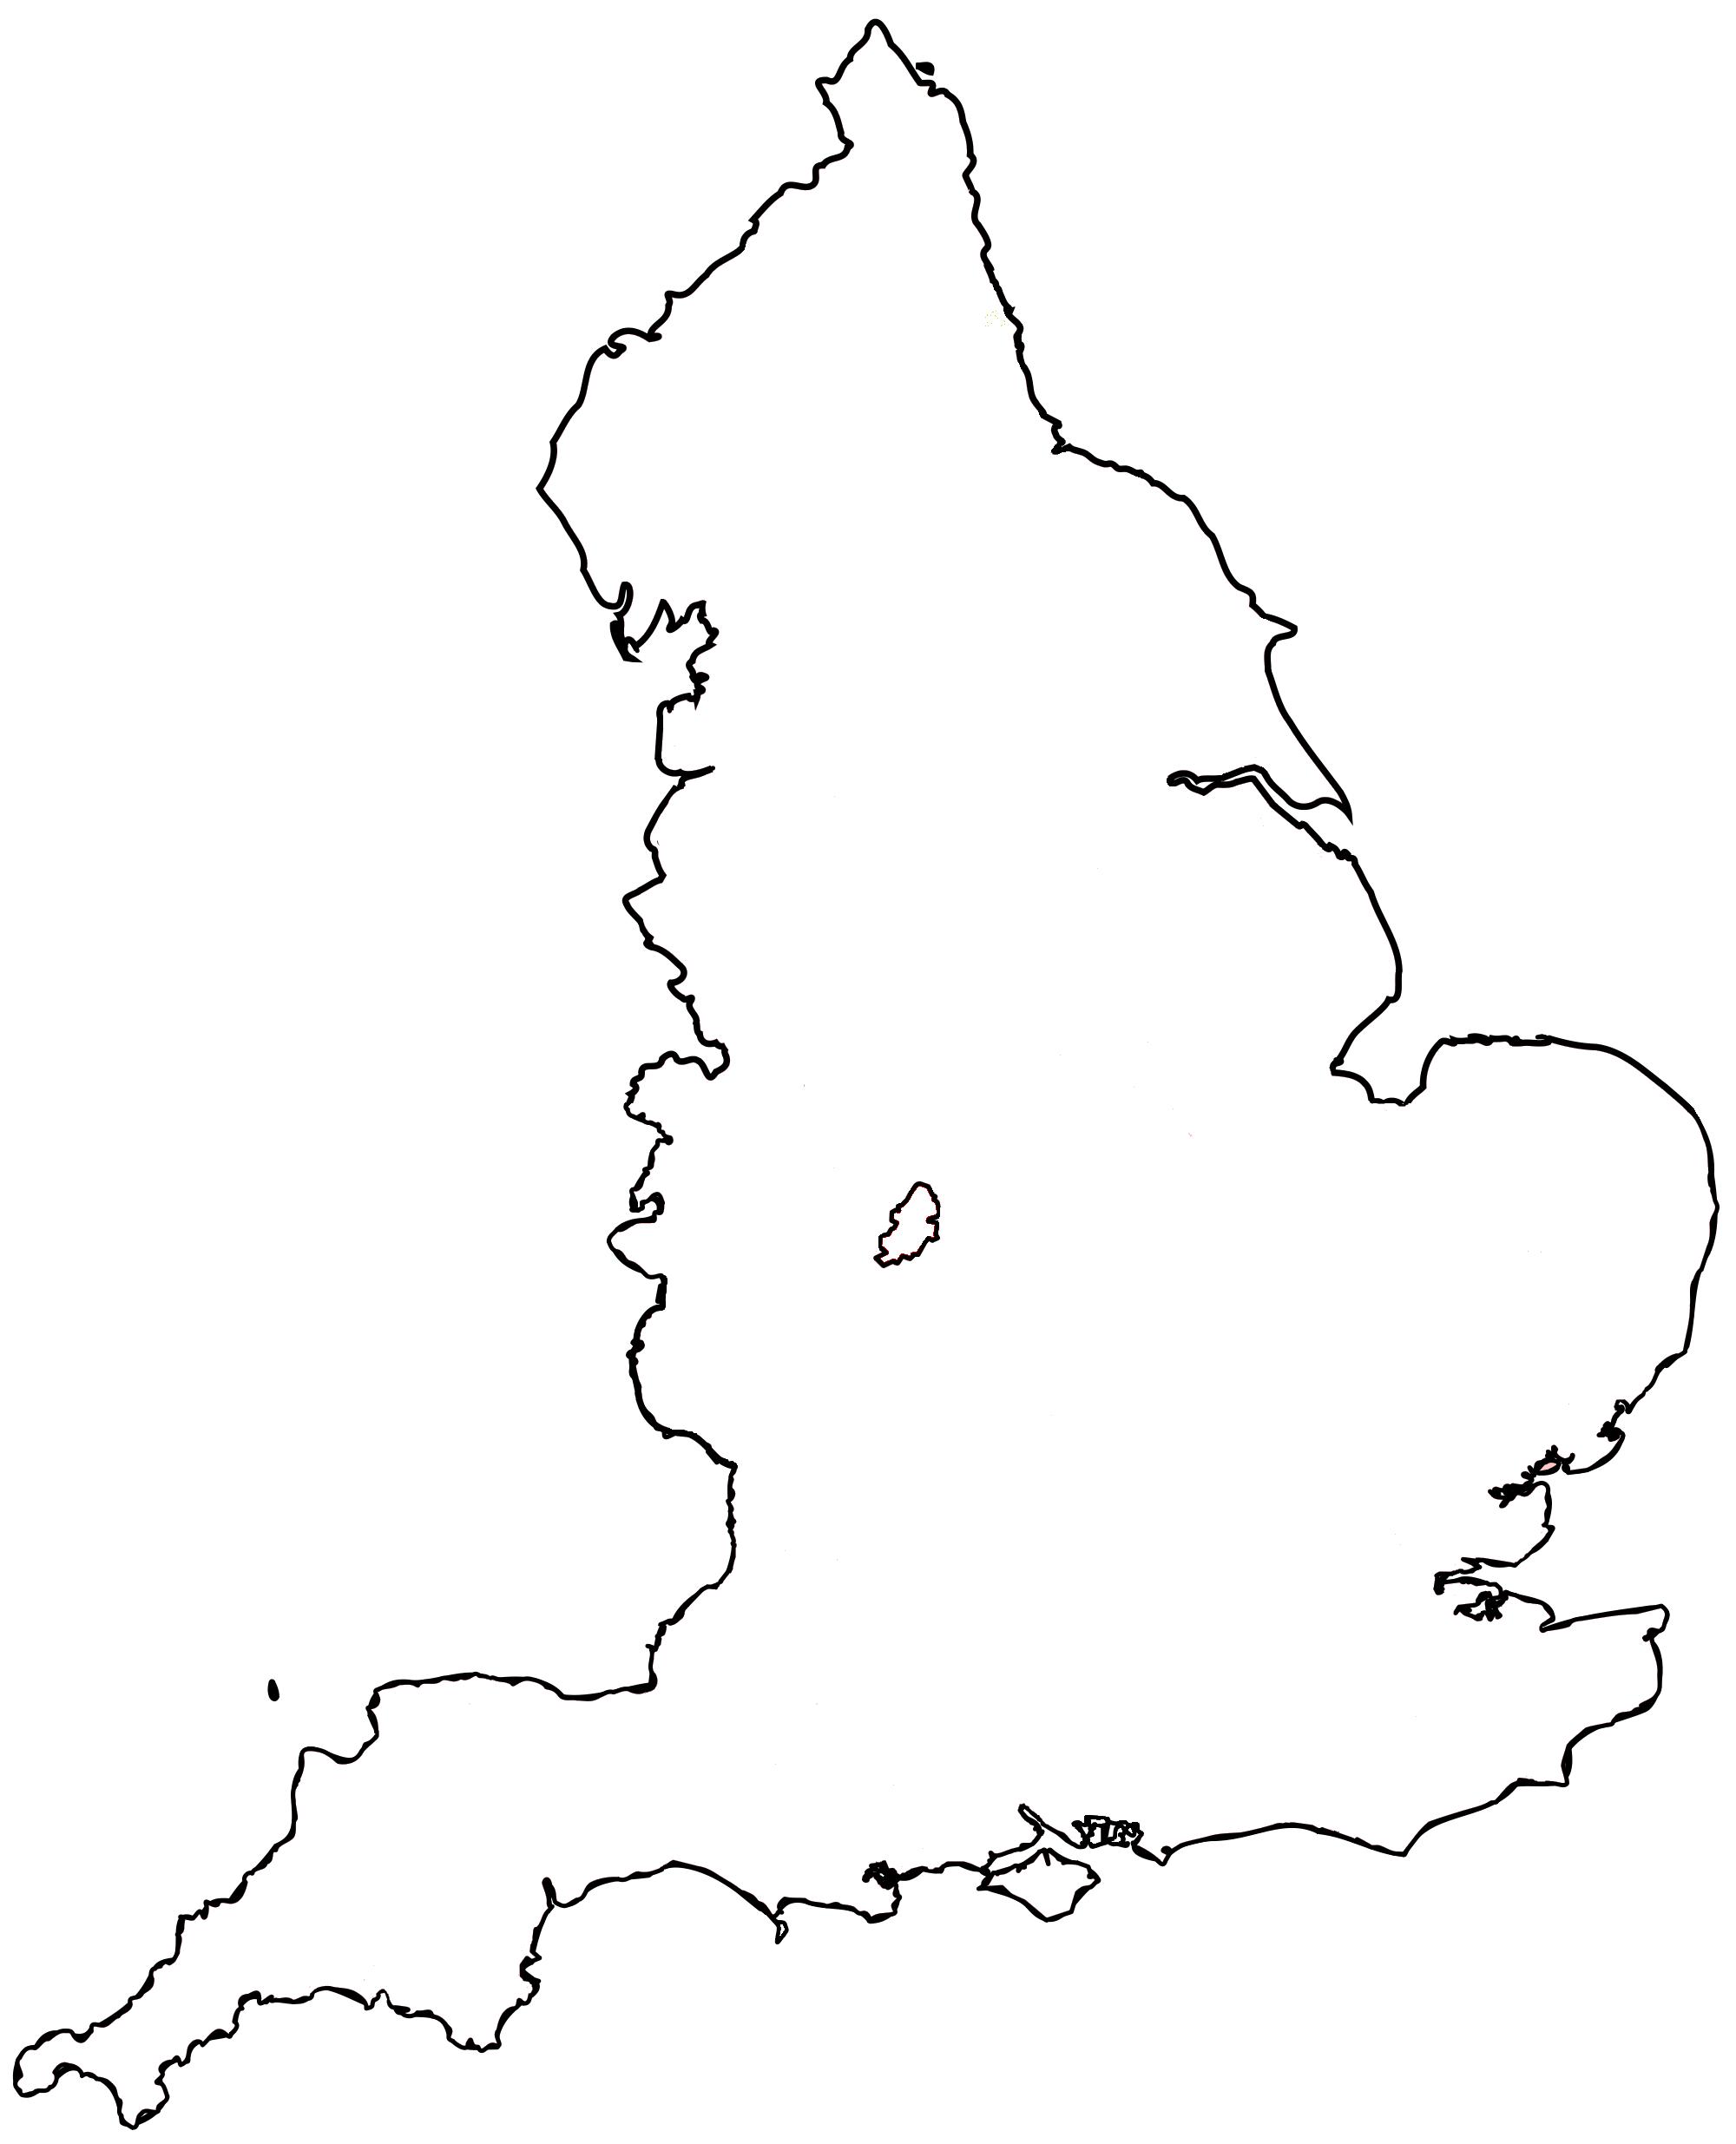 File:Birmingham UK Boundary.png.